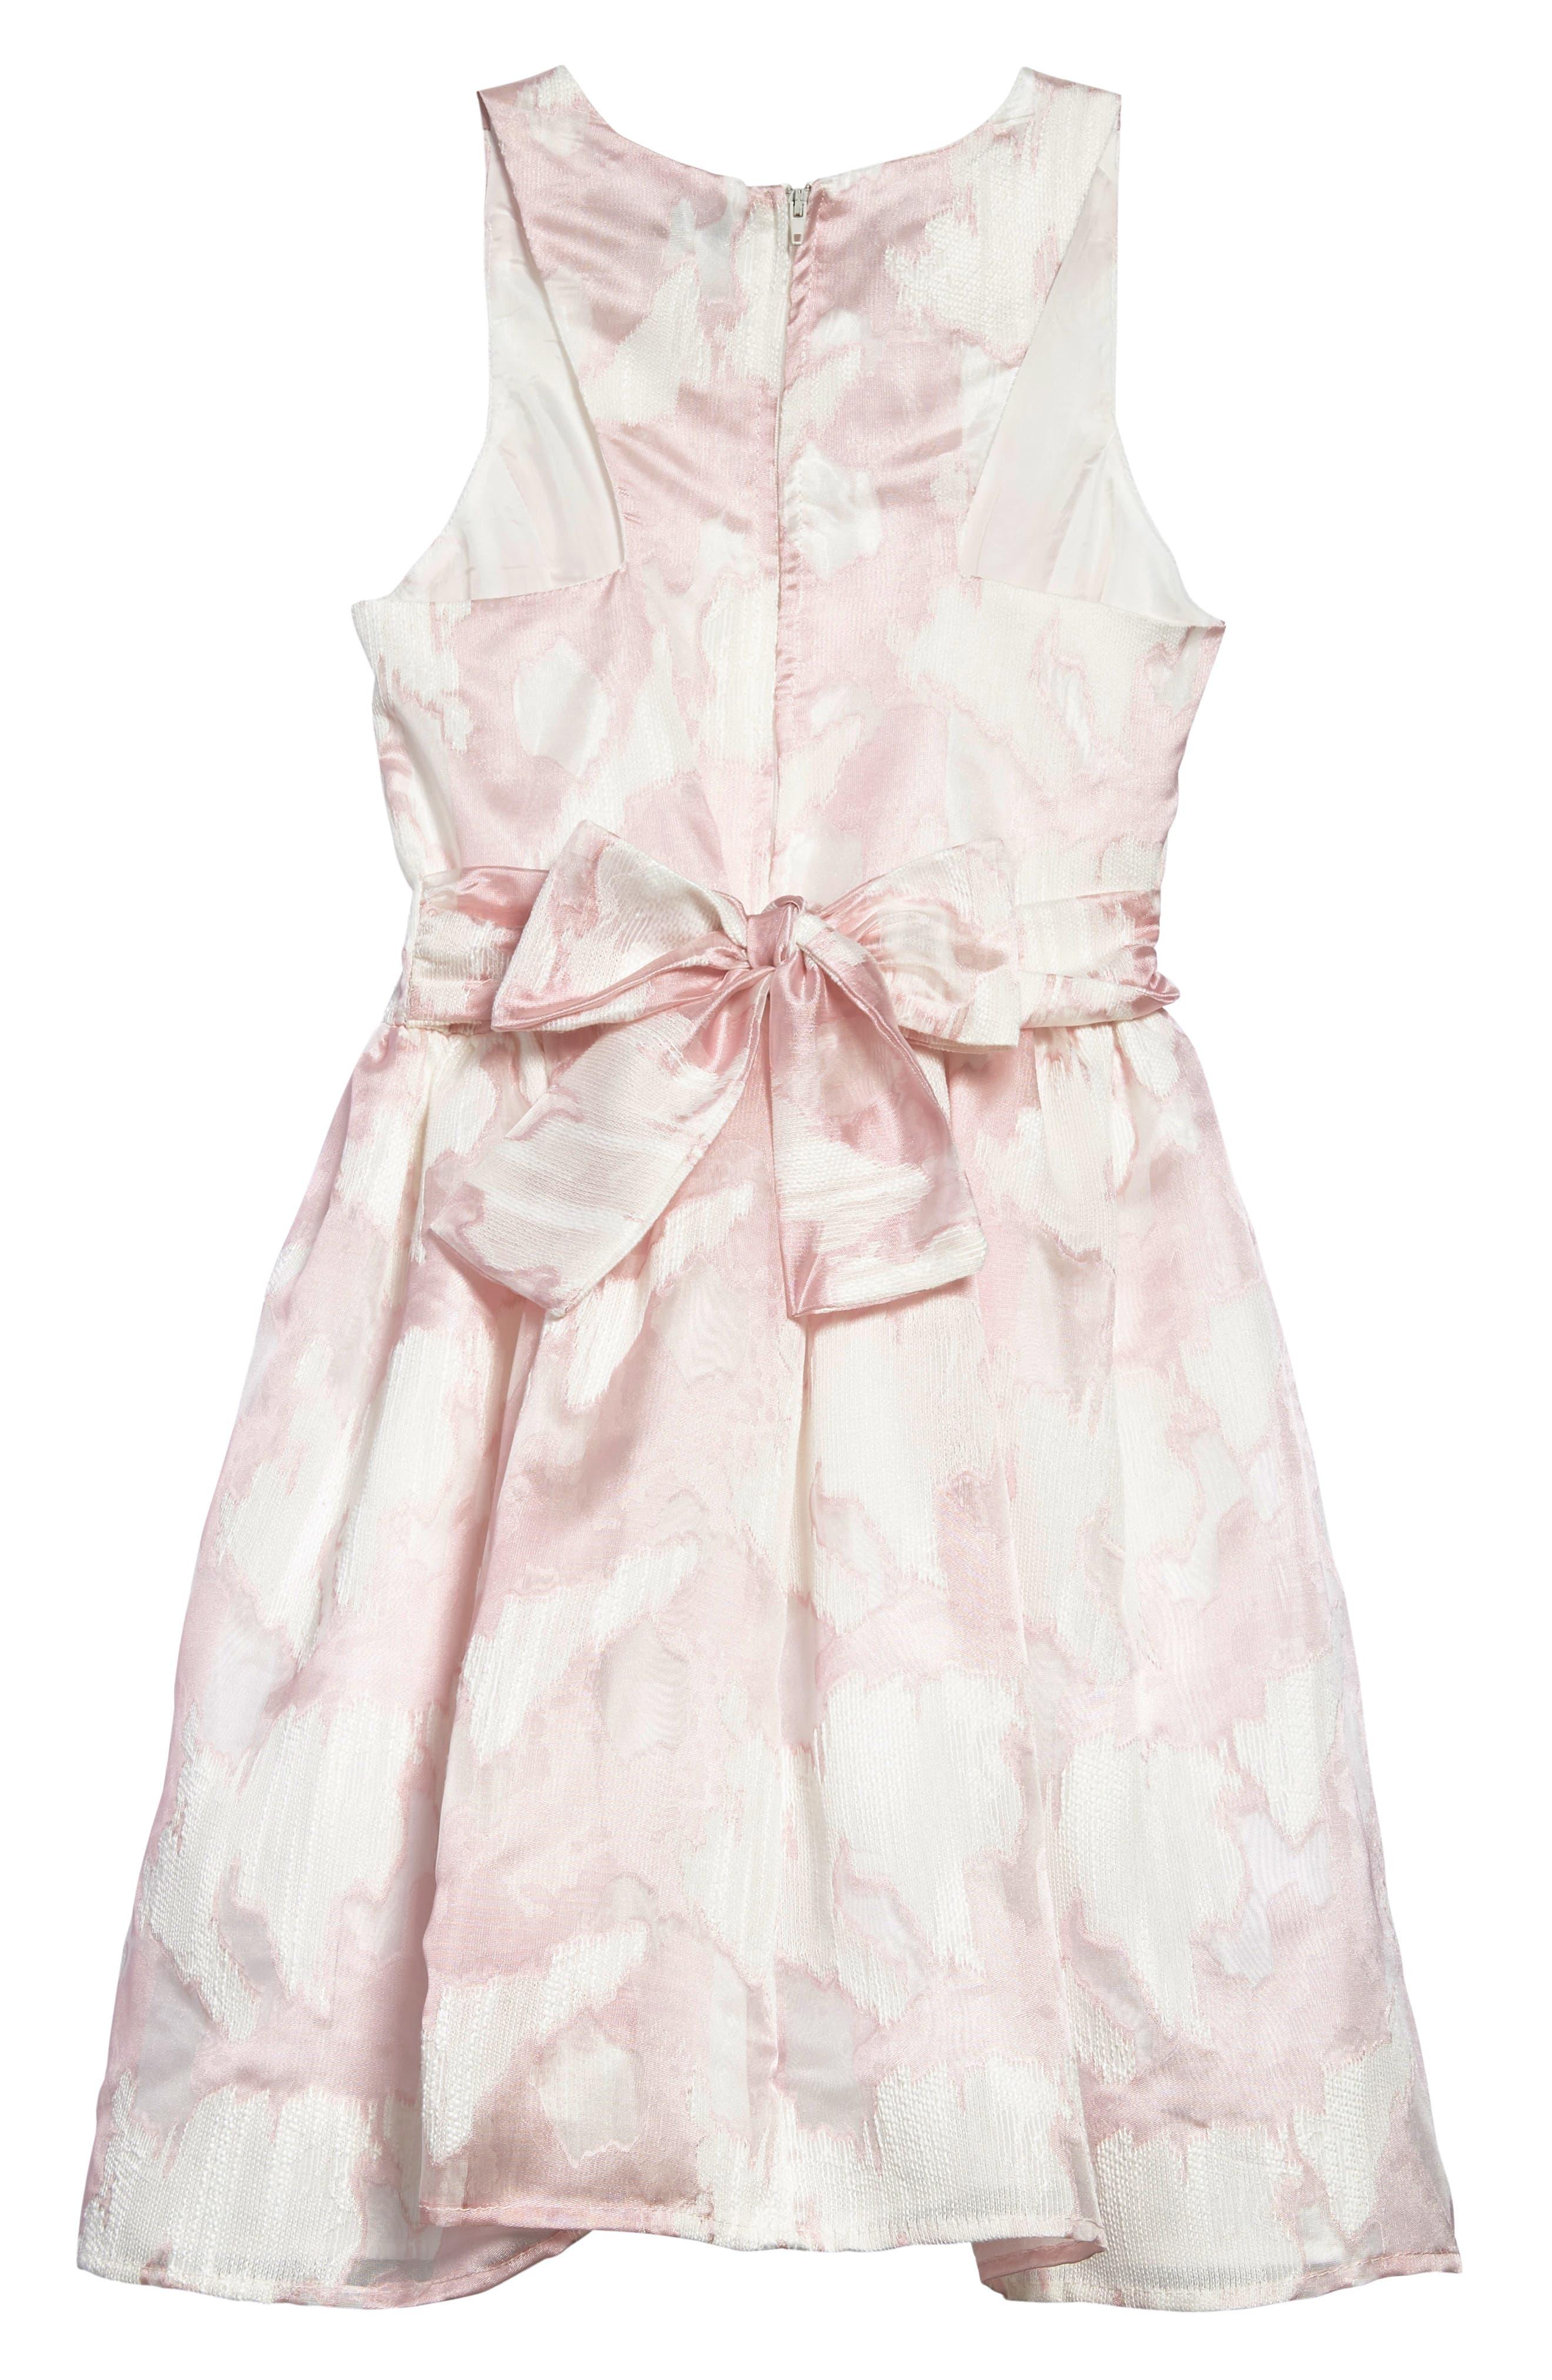 Chiffon Party Dress,                             Alternate thumbnail 2, color,                             Pink/ White